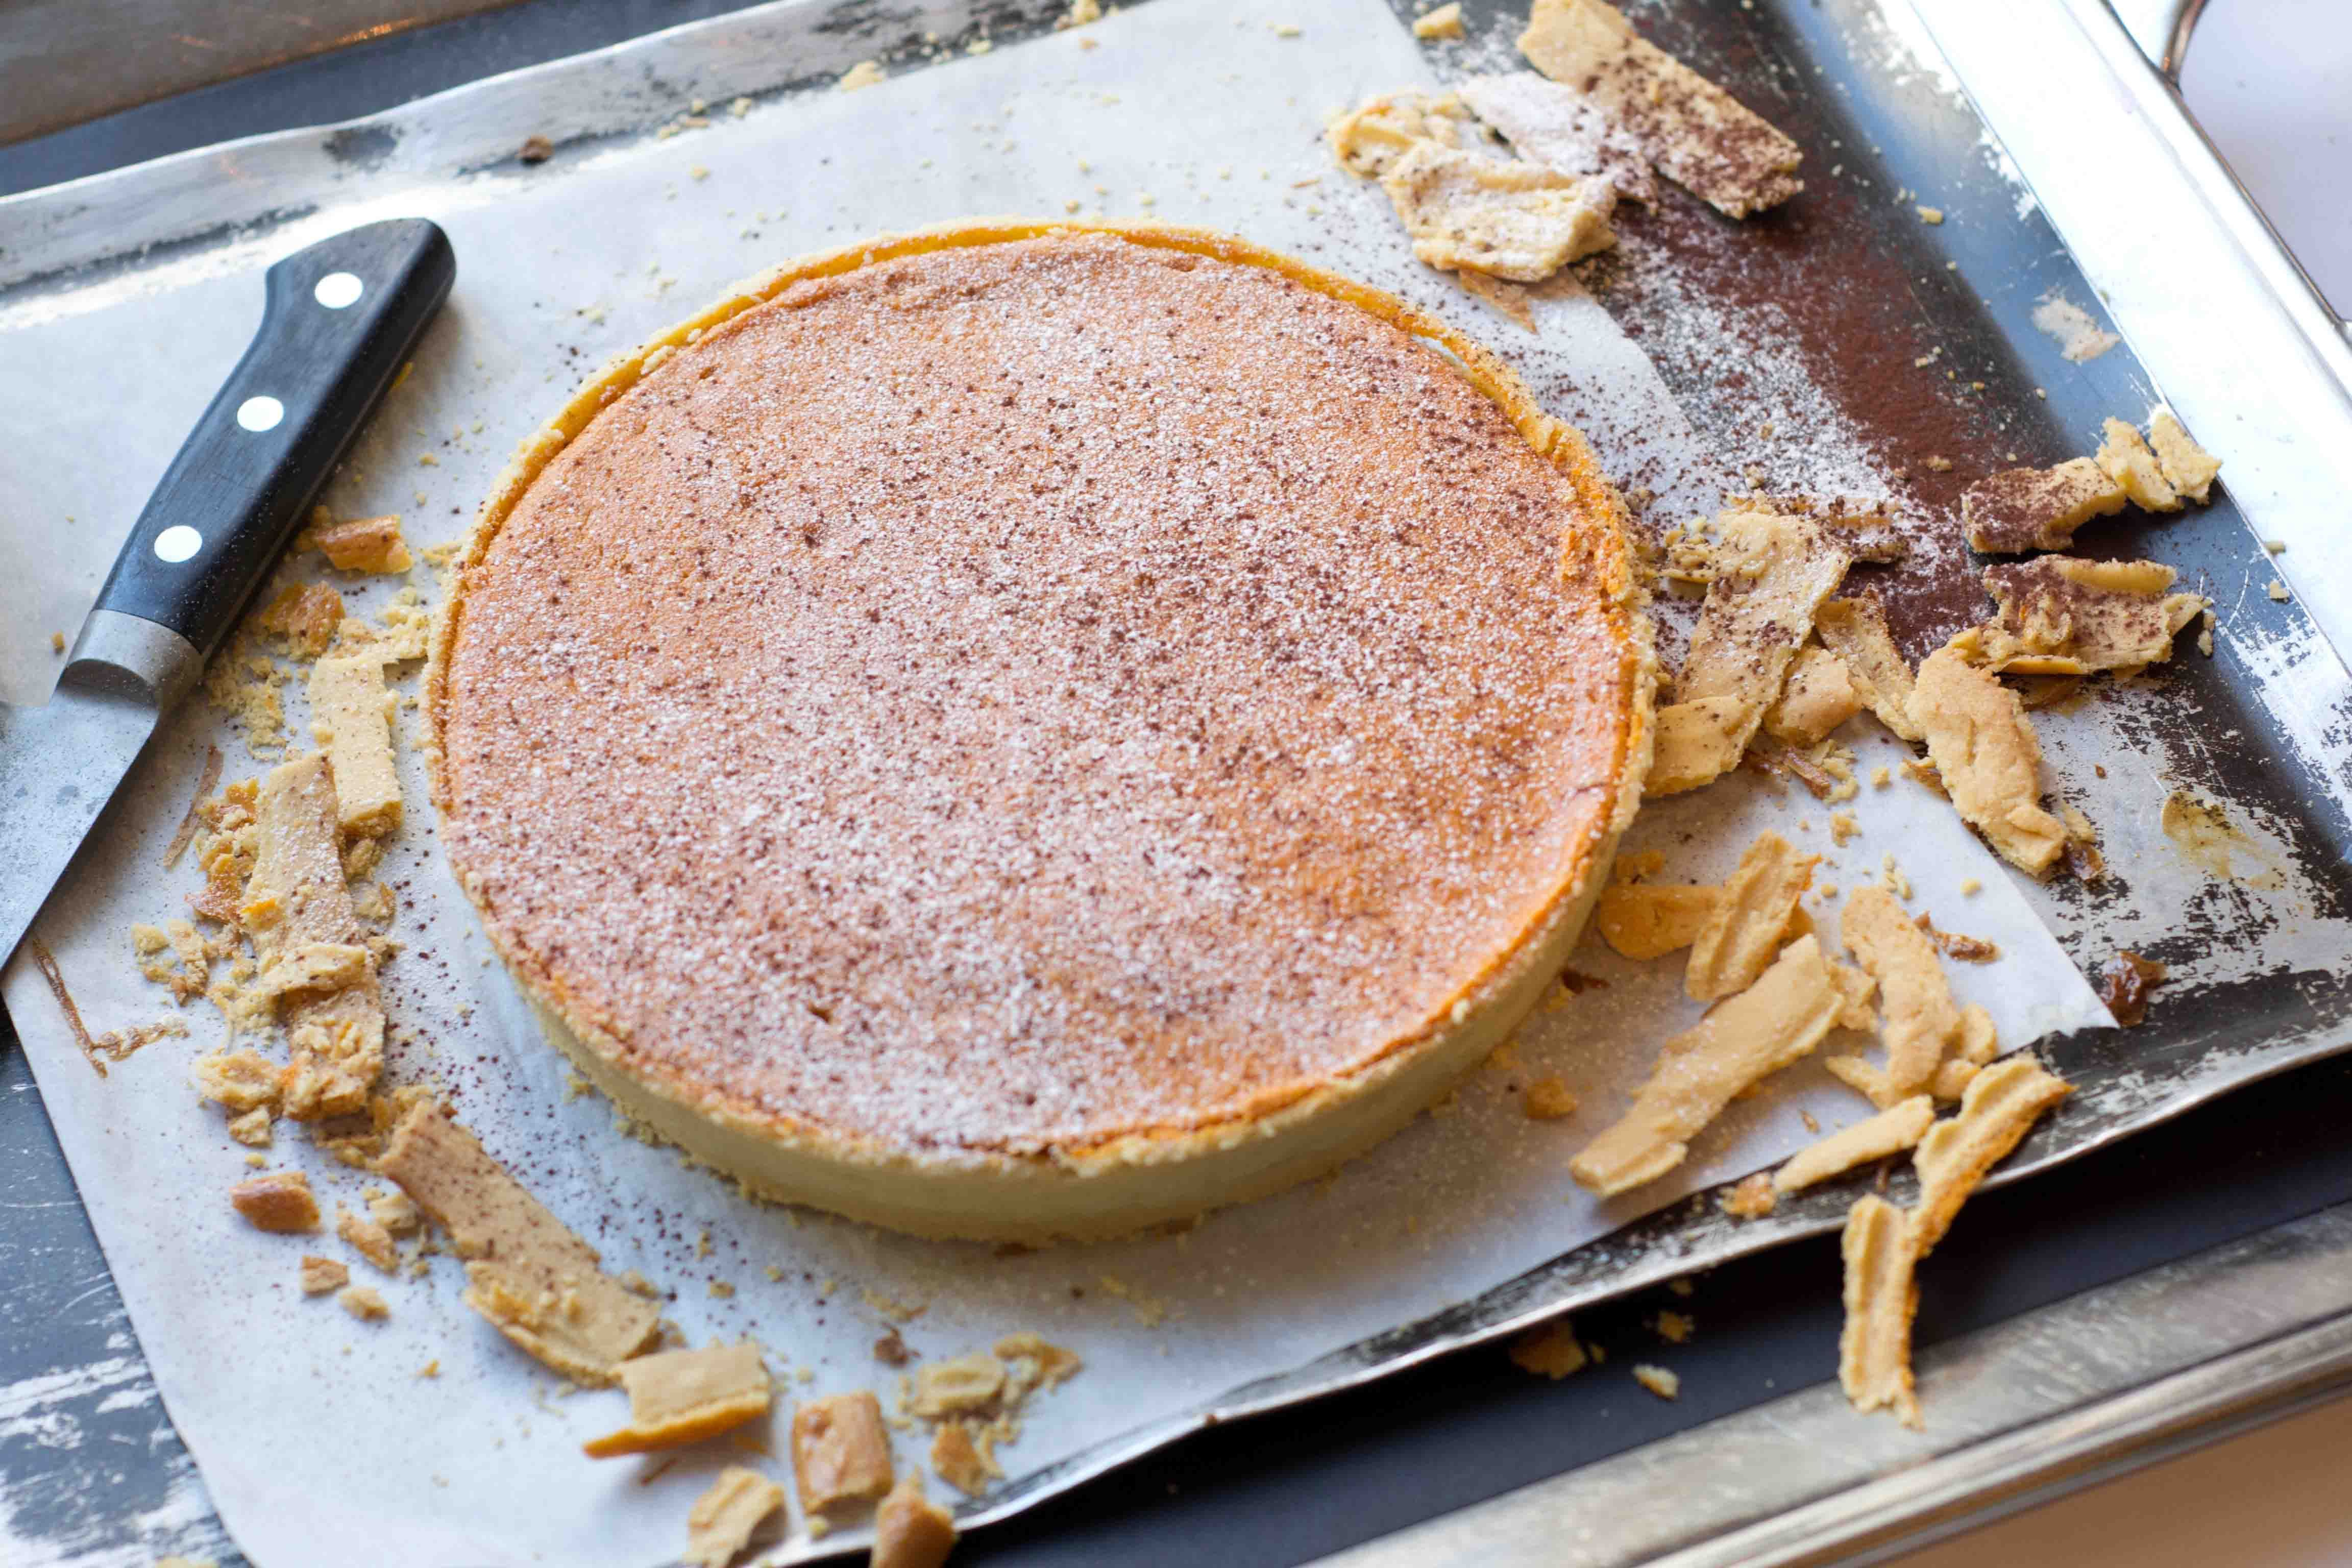 Weekend Recipe from Roux at The Landau - Chris King's Warm Spiced Pumpkin Tart http://rouxatthelandau.com/recipes/warm_spiced_pumpkin_tart/ #recipe